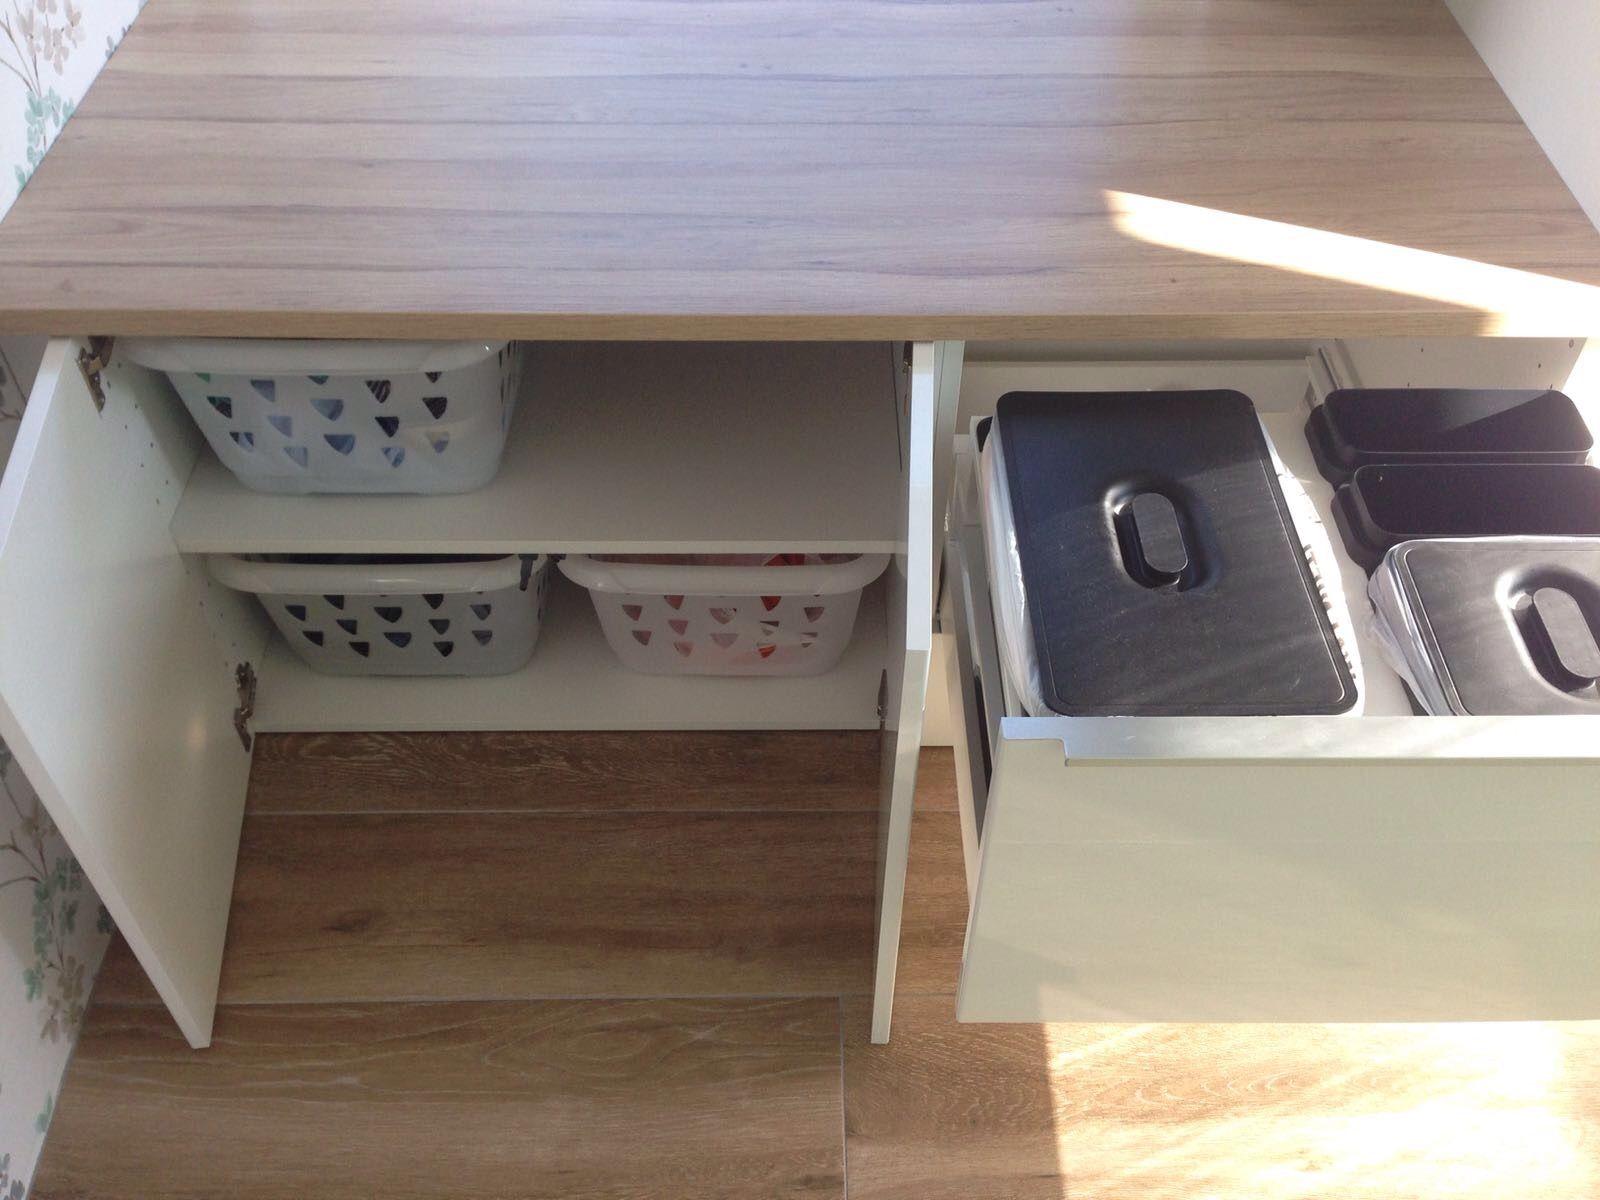 Badkamerkast Met Wasmand.Wasmand Kast Ikea Badkamerkast Met Wasmand 2 Modern Lillngen Kast